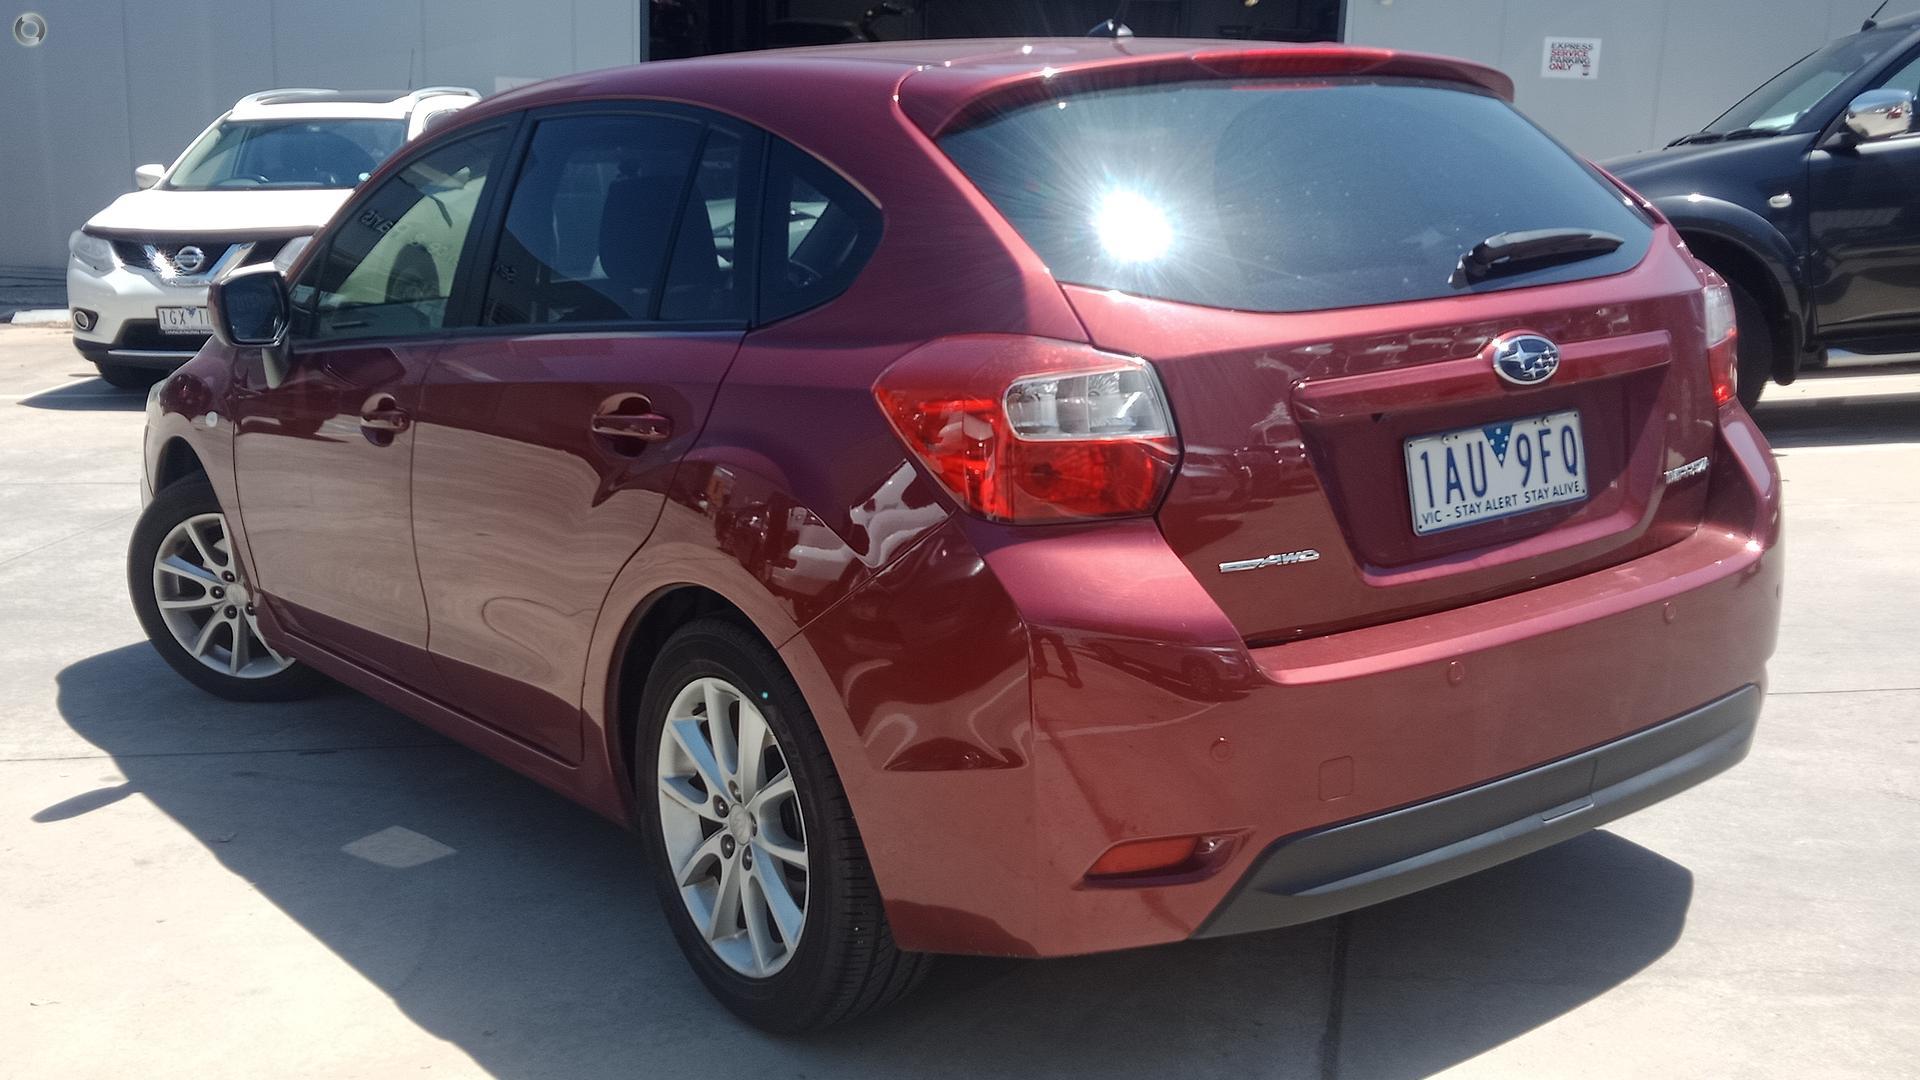 2014 Subaru Impreza 2.0i-L G4